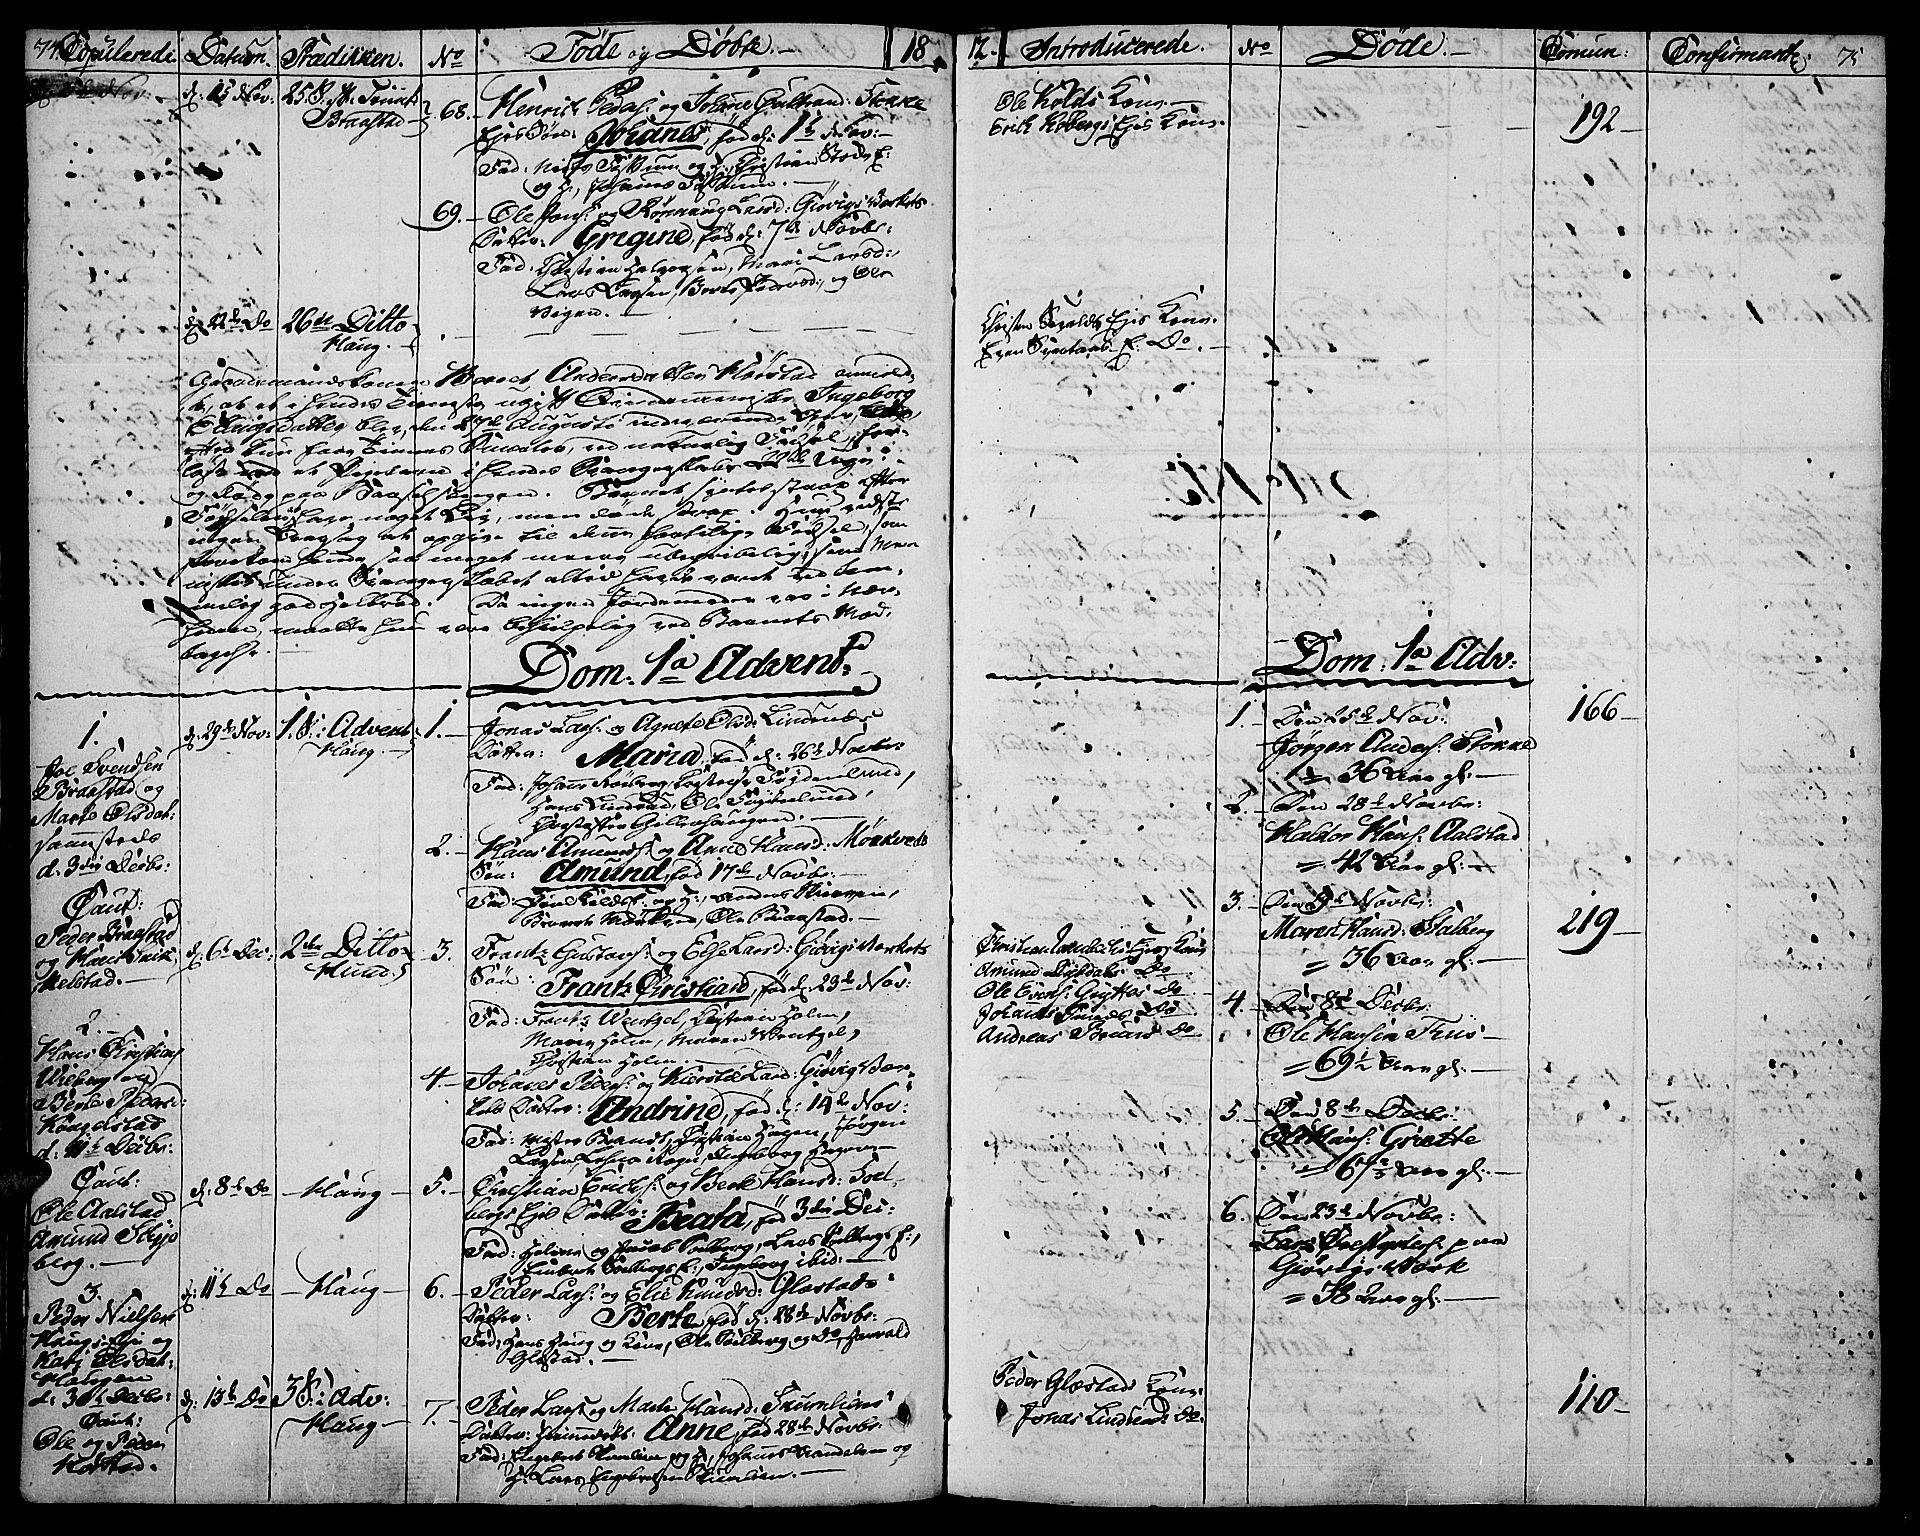 SAH, Vardal prestekontor, H/Ha/Haa/L0003: Ministerialbok nr. 3, 1808-1814, s. 74-75